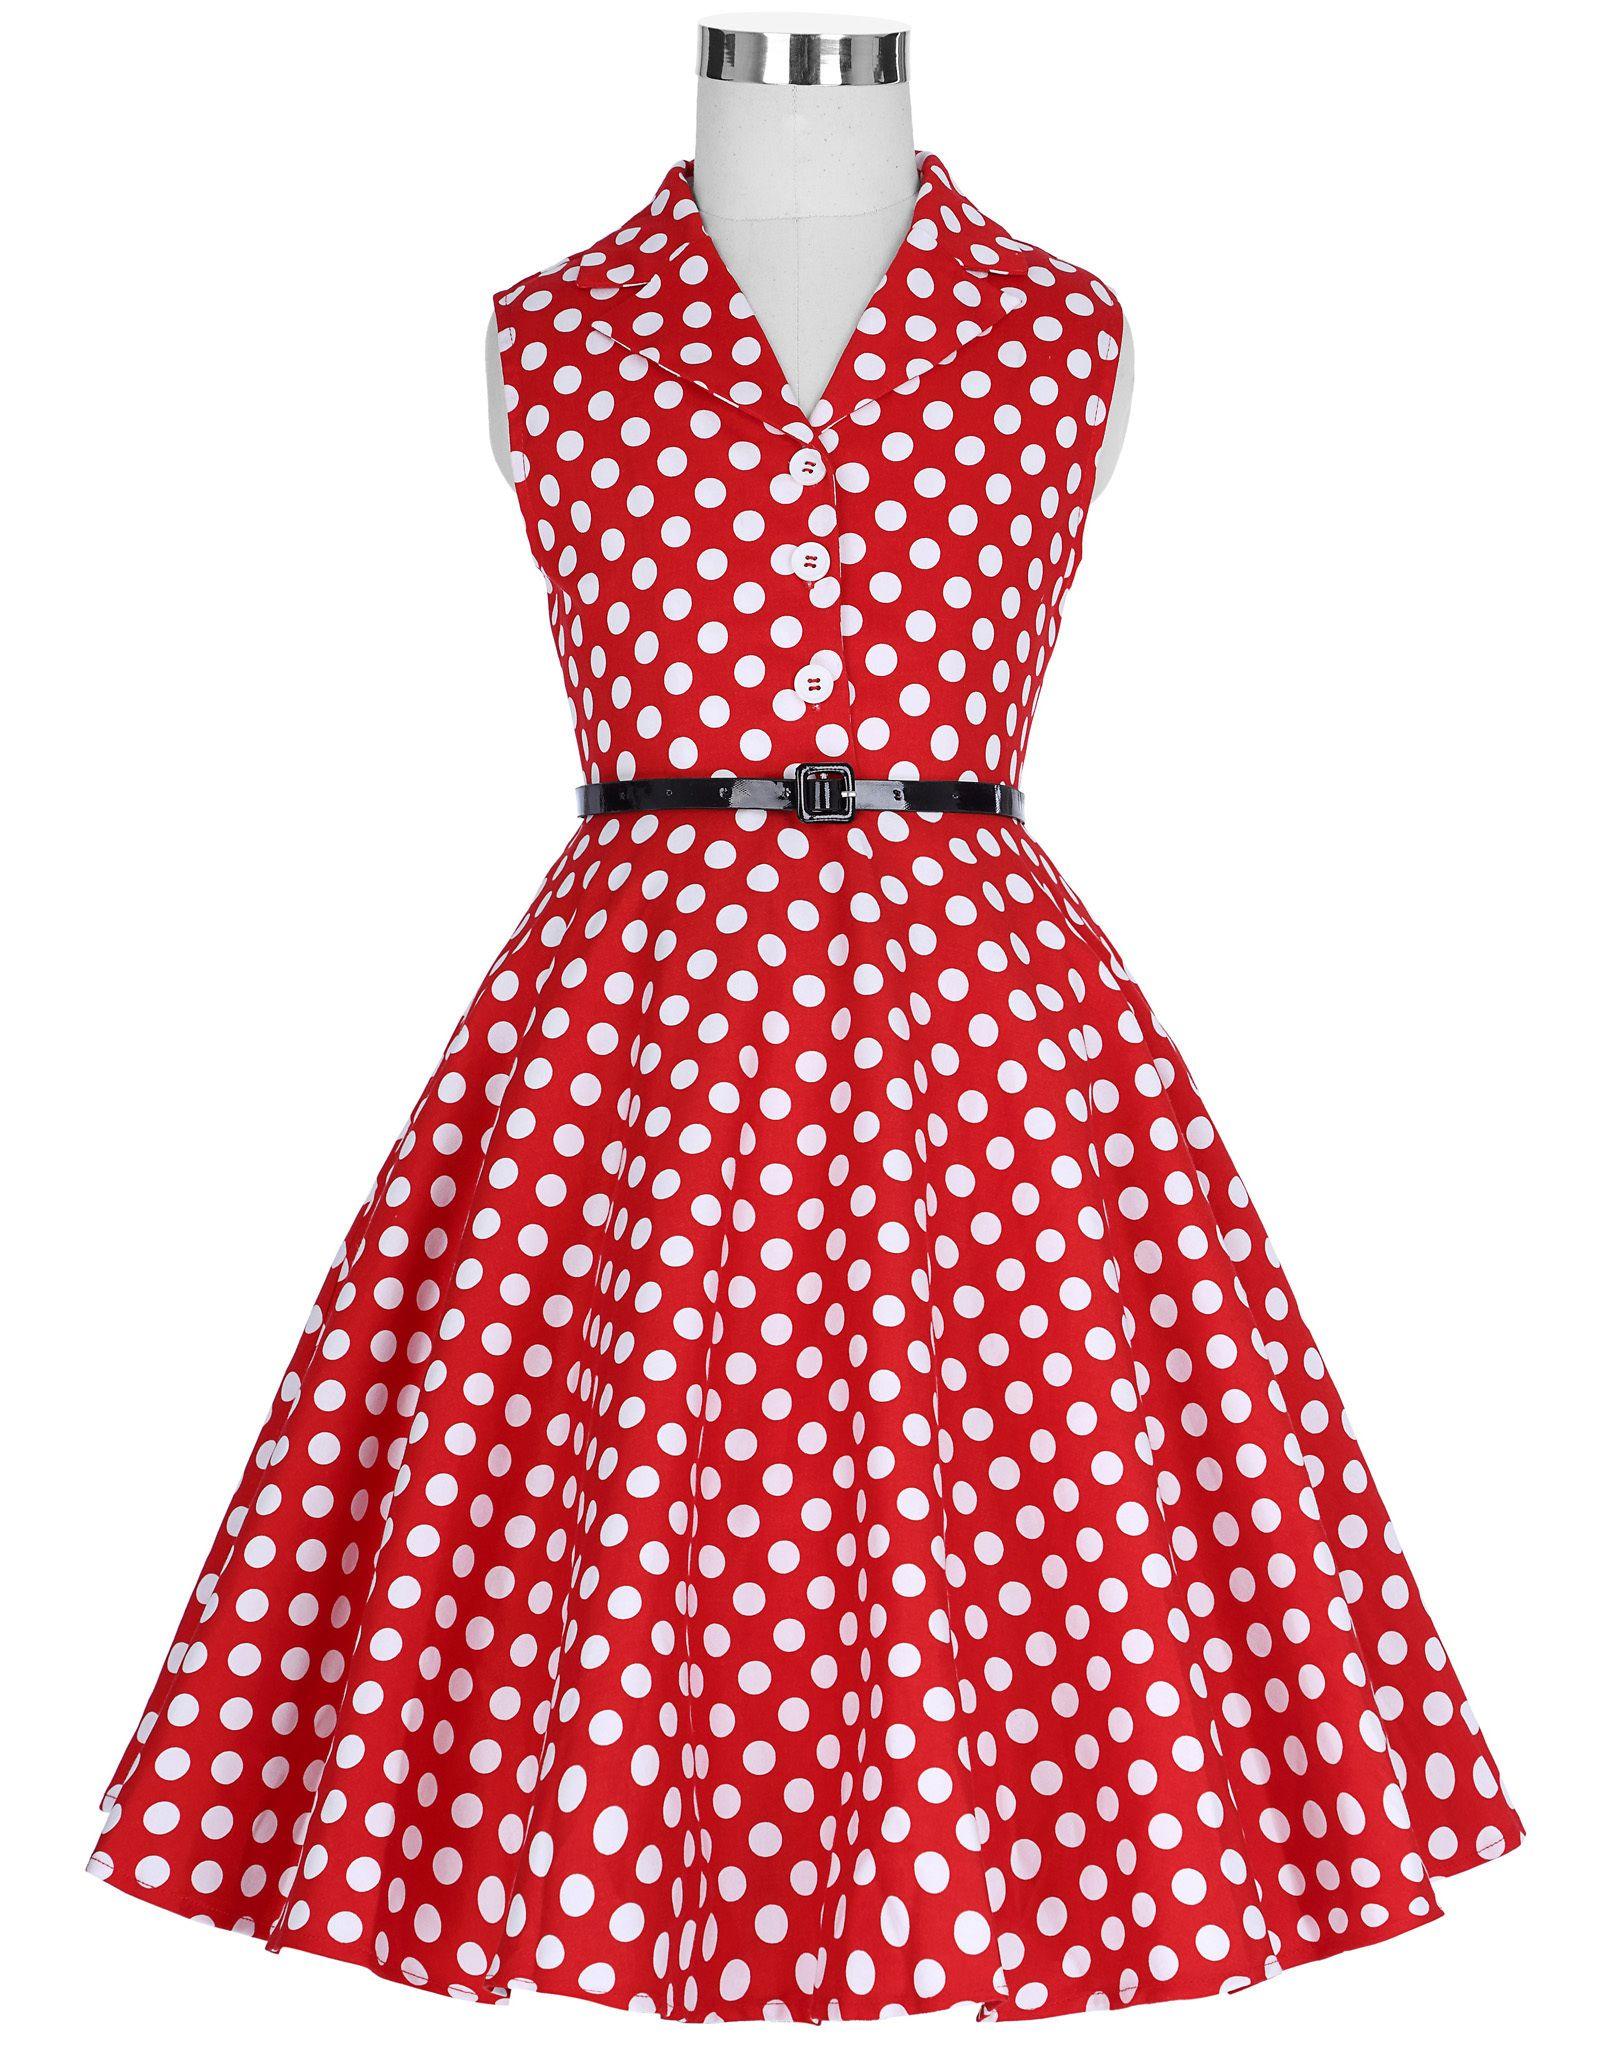 New Children Kids Girls Retro Vintage Sleeveless Lapel Collar Polka Dots Dress J190514